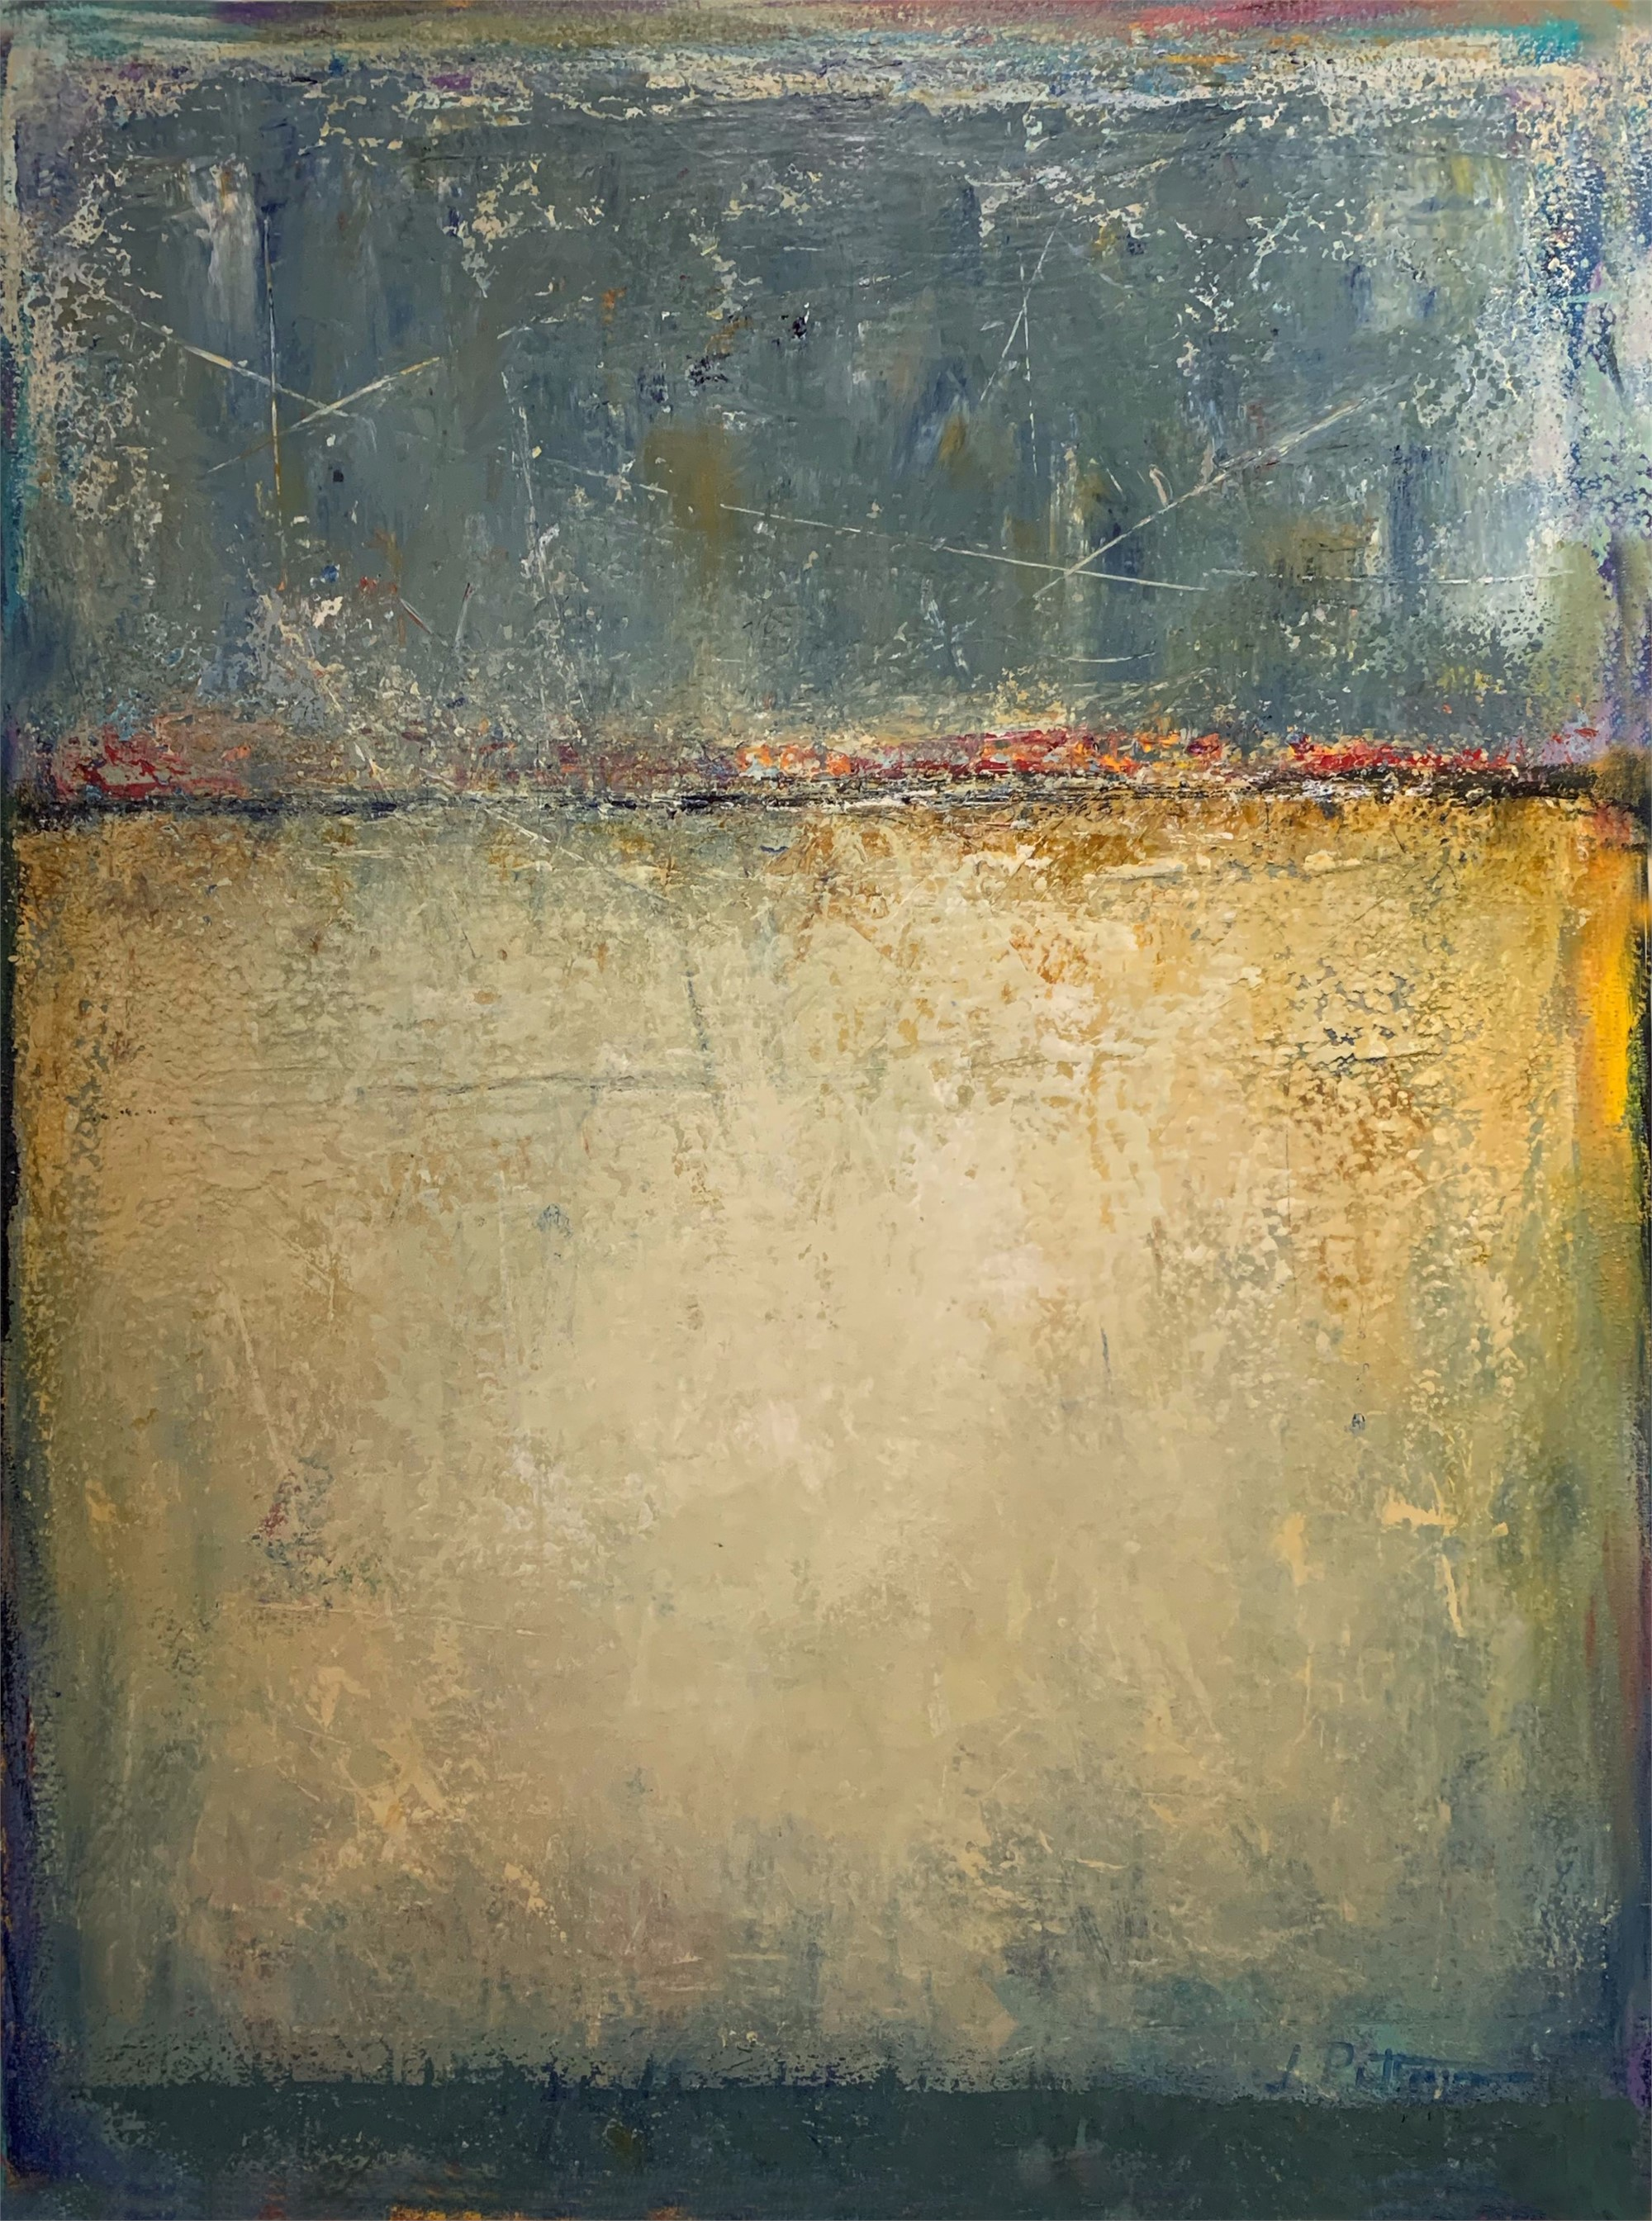 Oceana by Jim Pittman